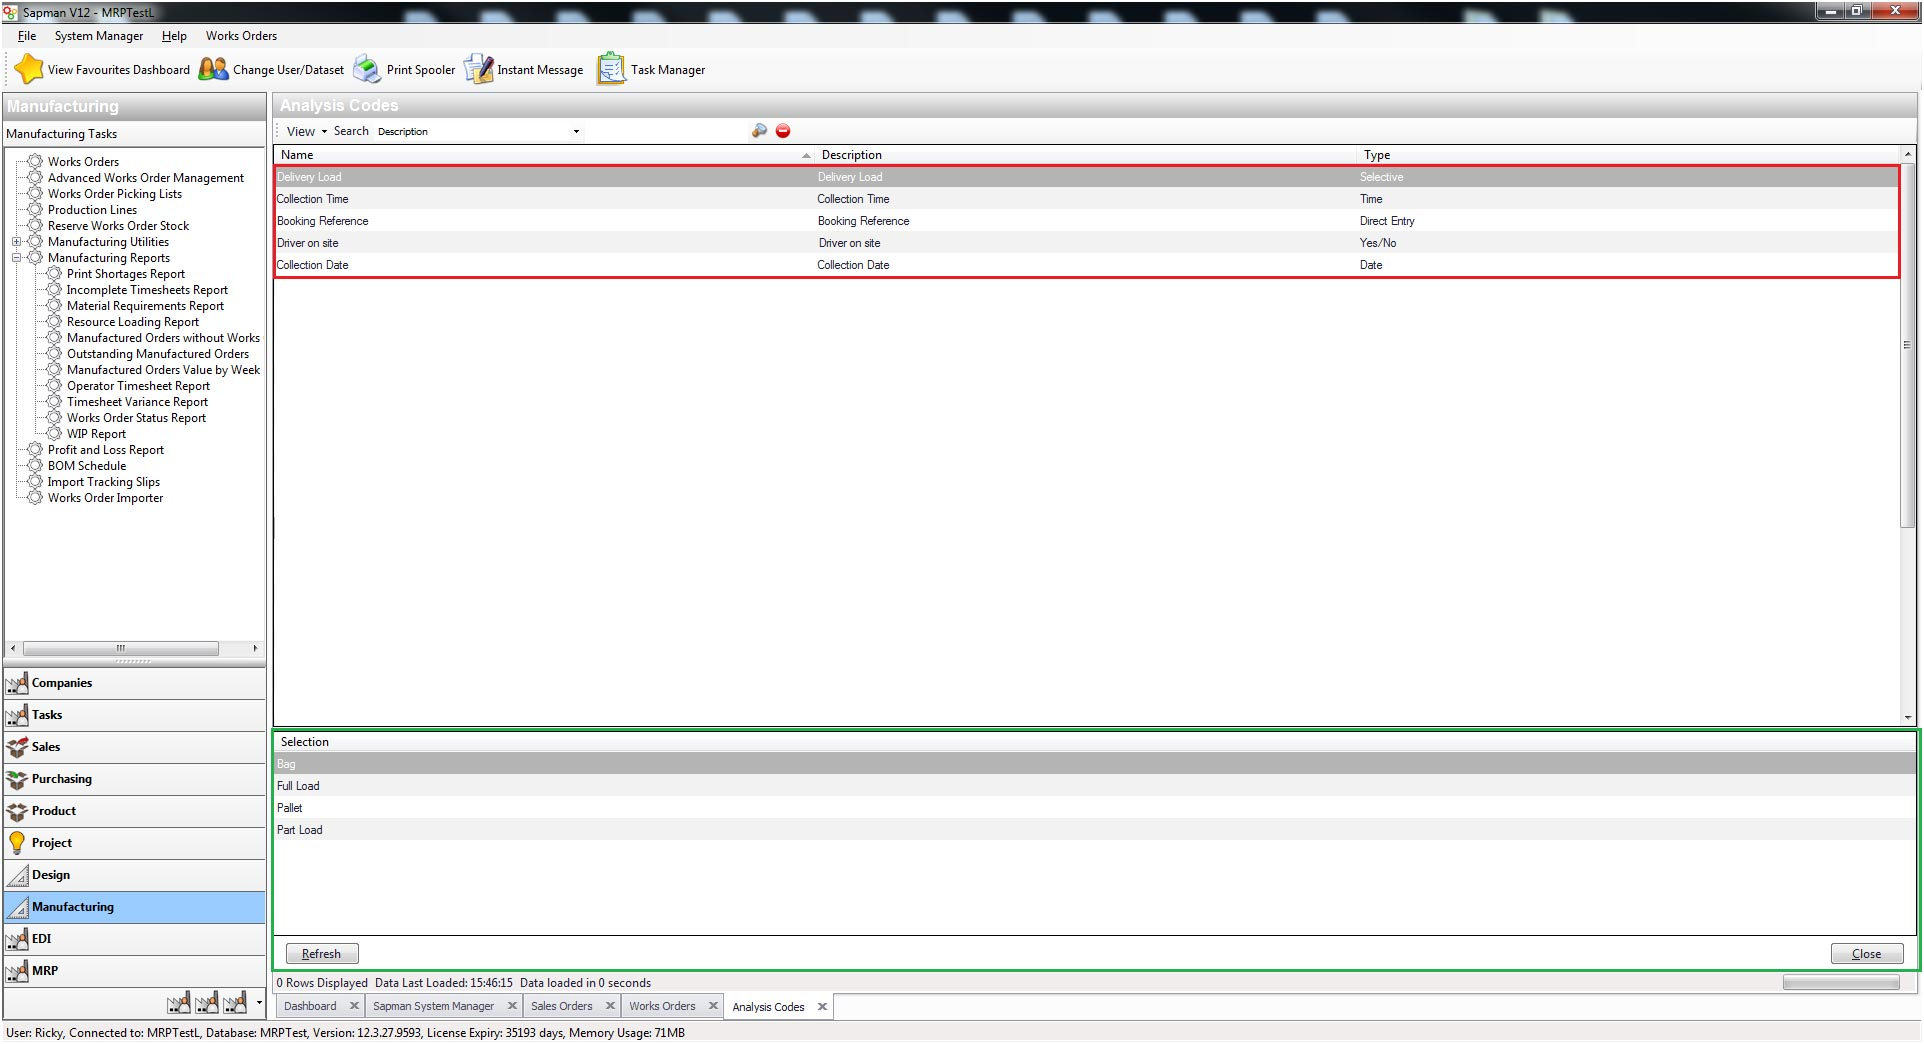 Sapman v12 Analysis Code Manager screen